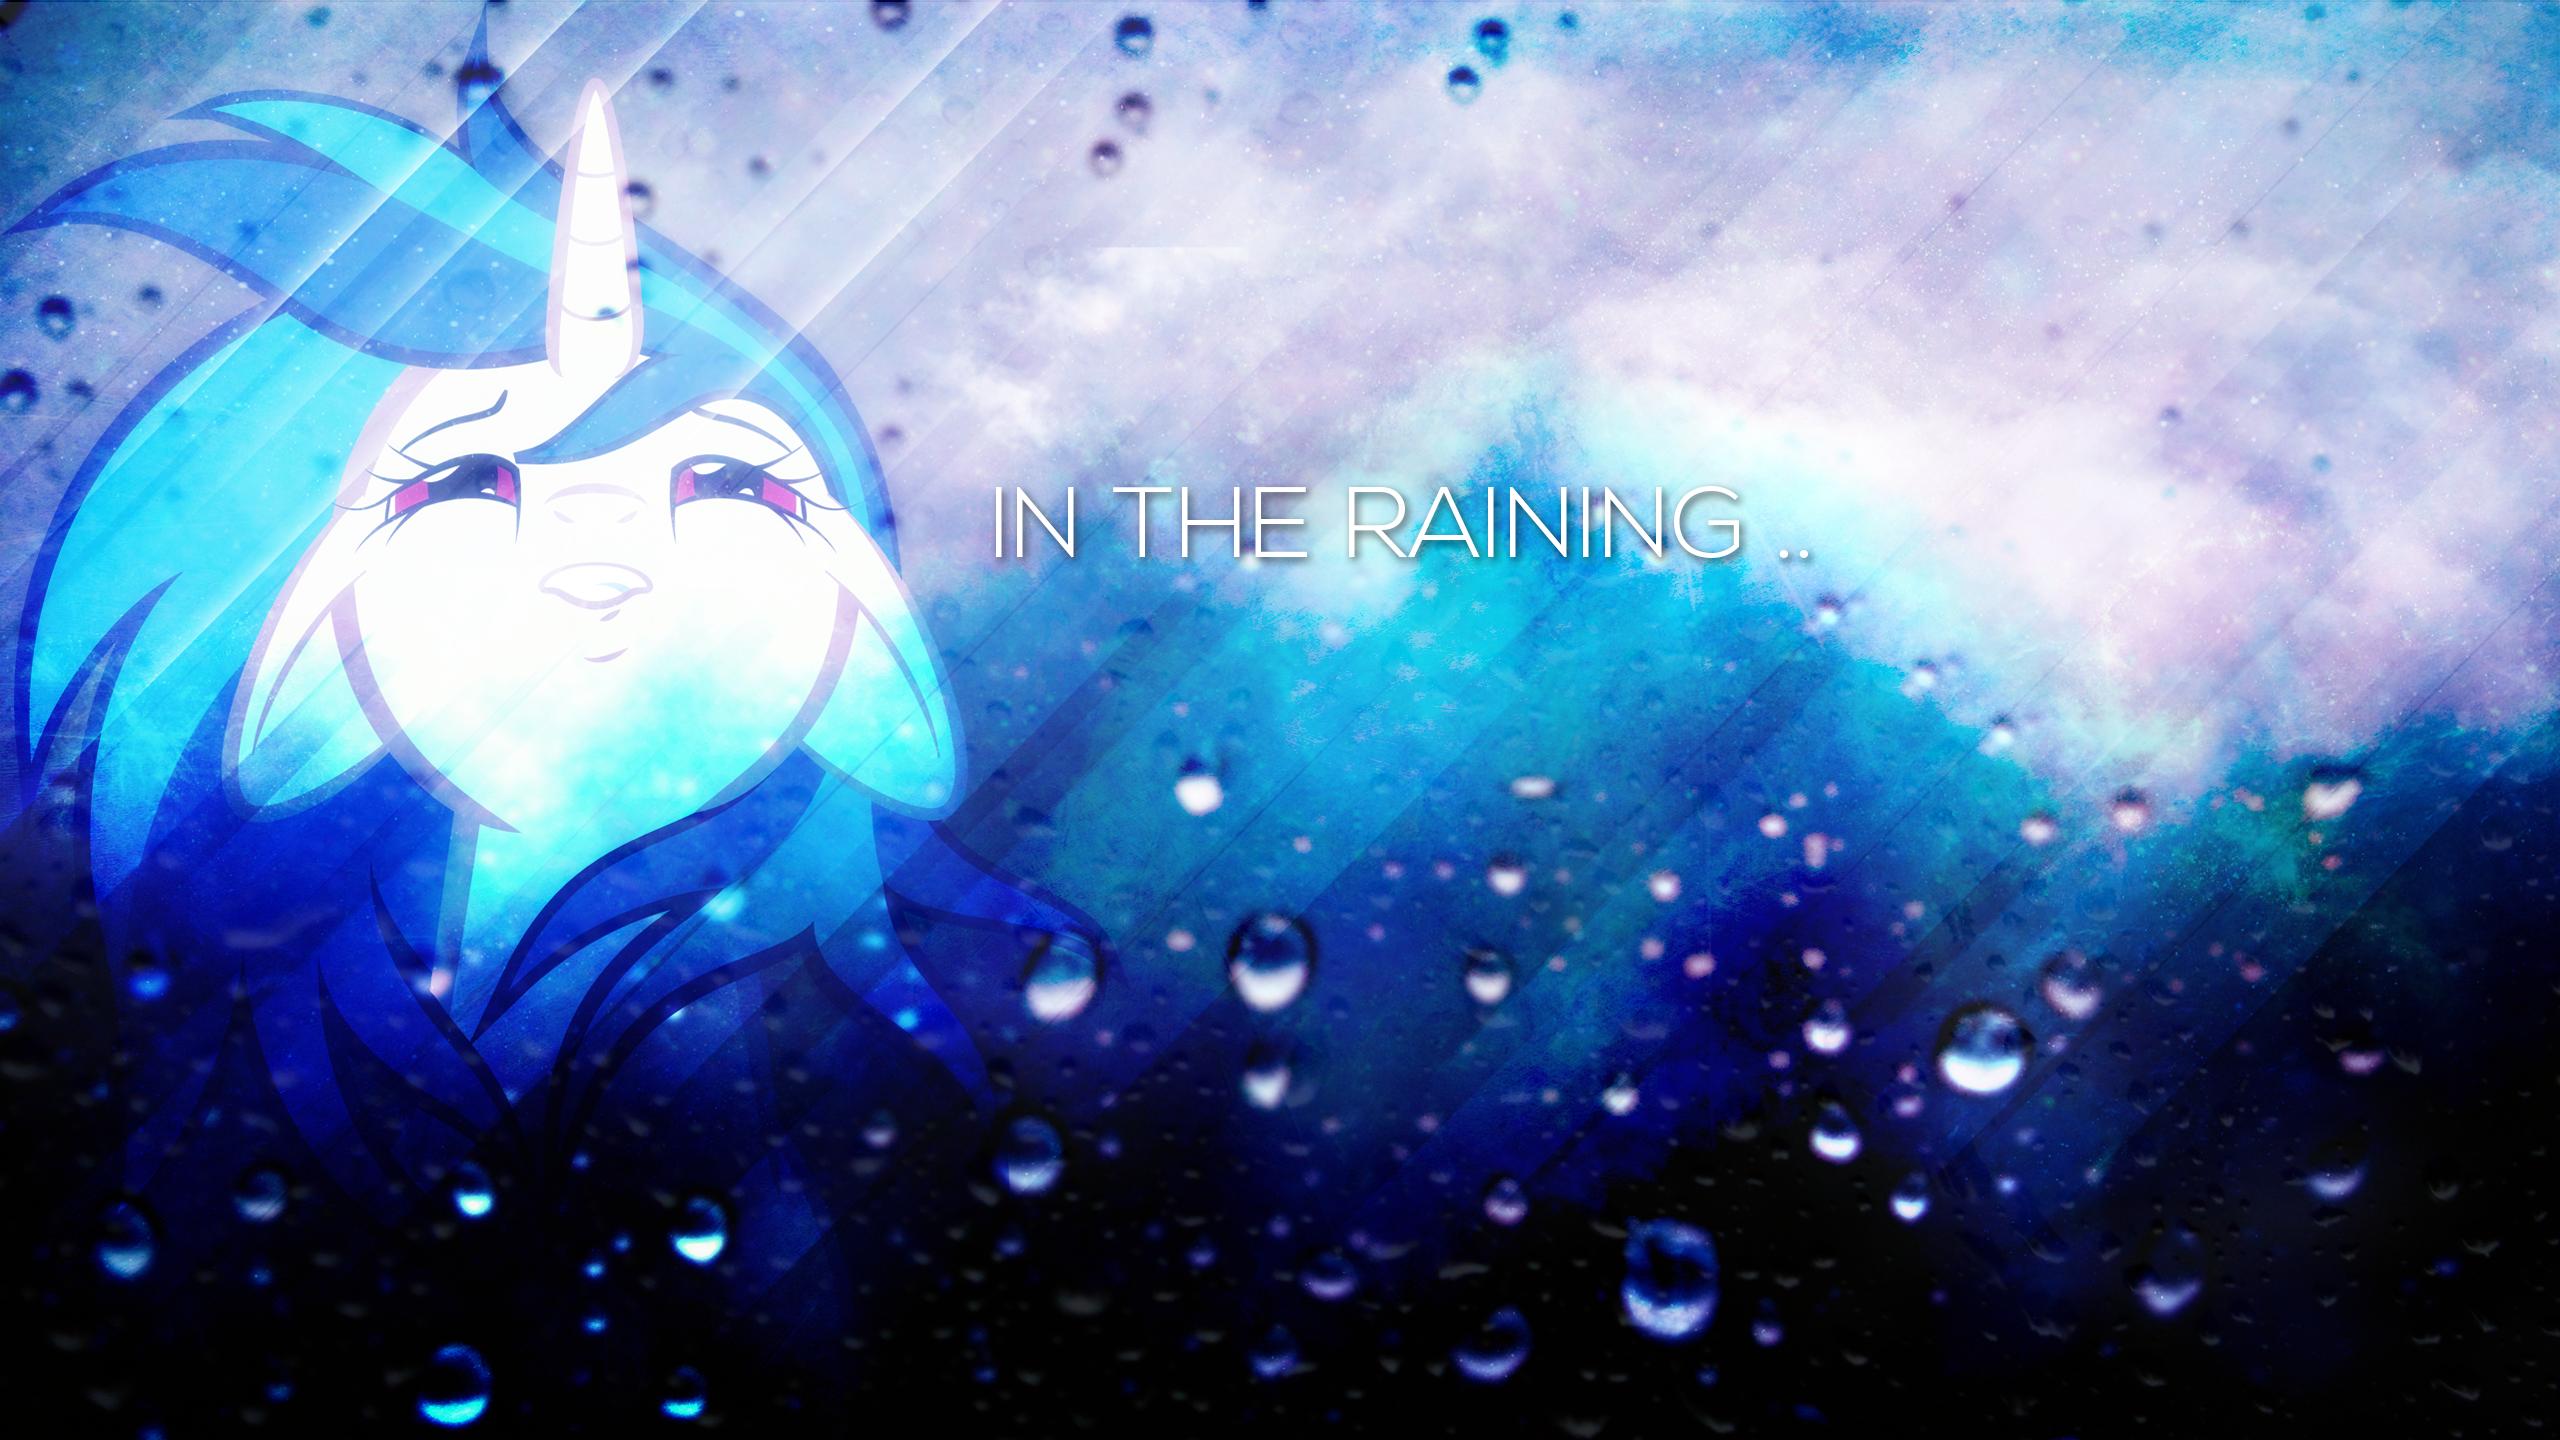 In the Raining . 2560 x 1440 HD Wallpaper